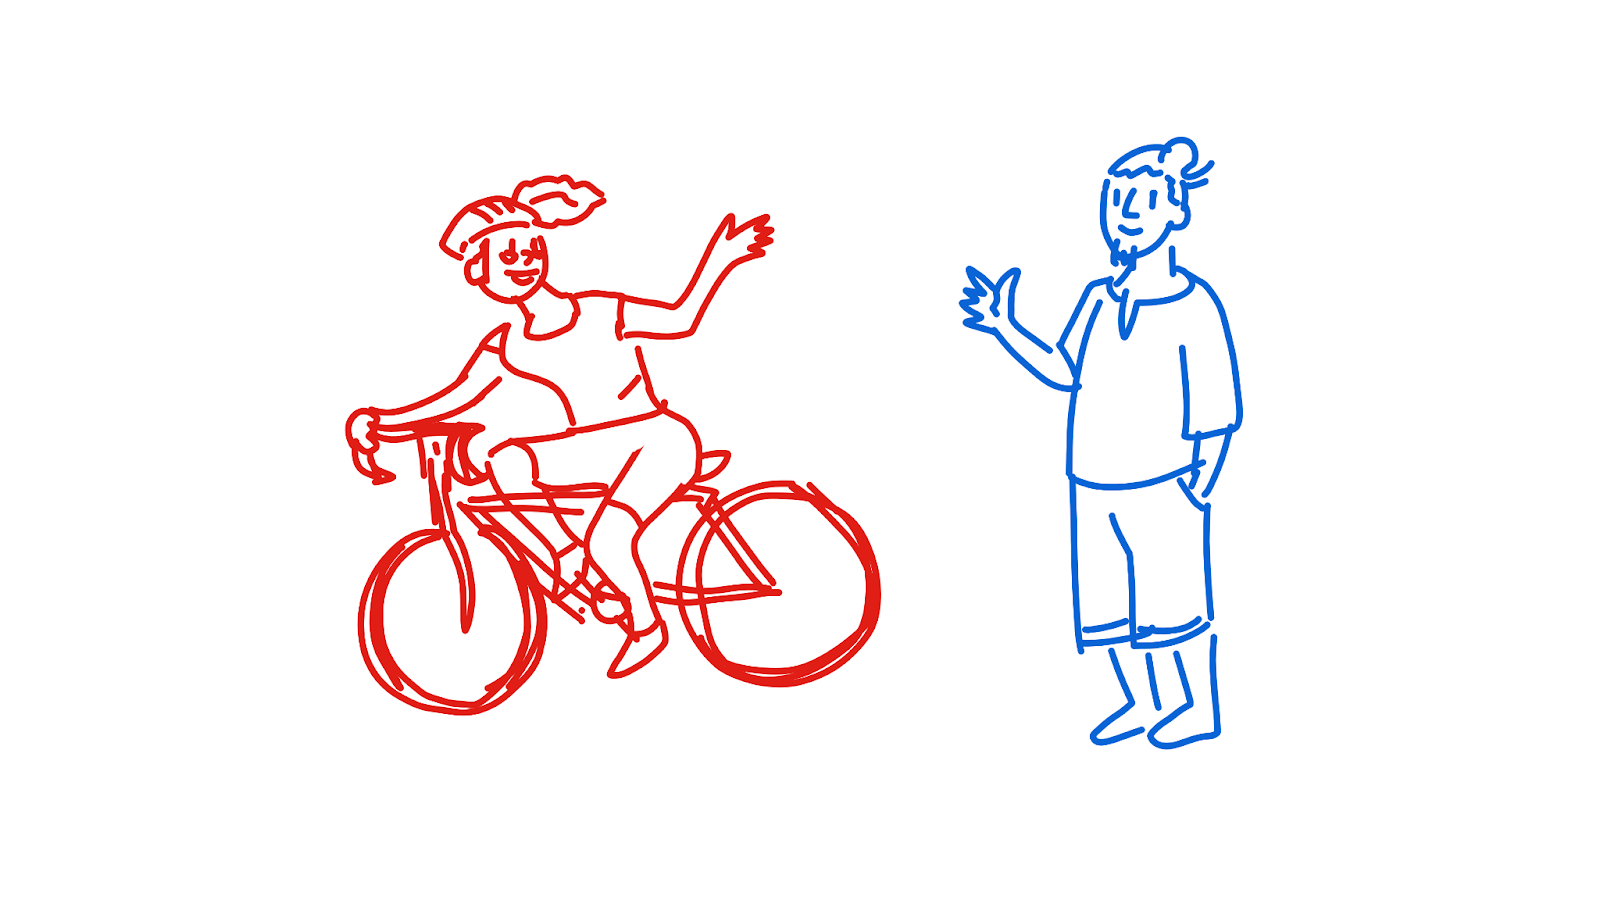 Alice rides off on her new bike, waving goodbye to Bob.